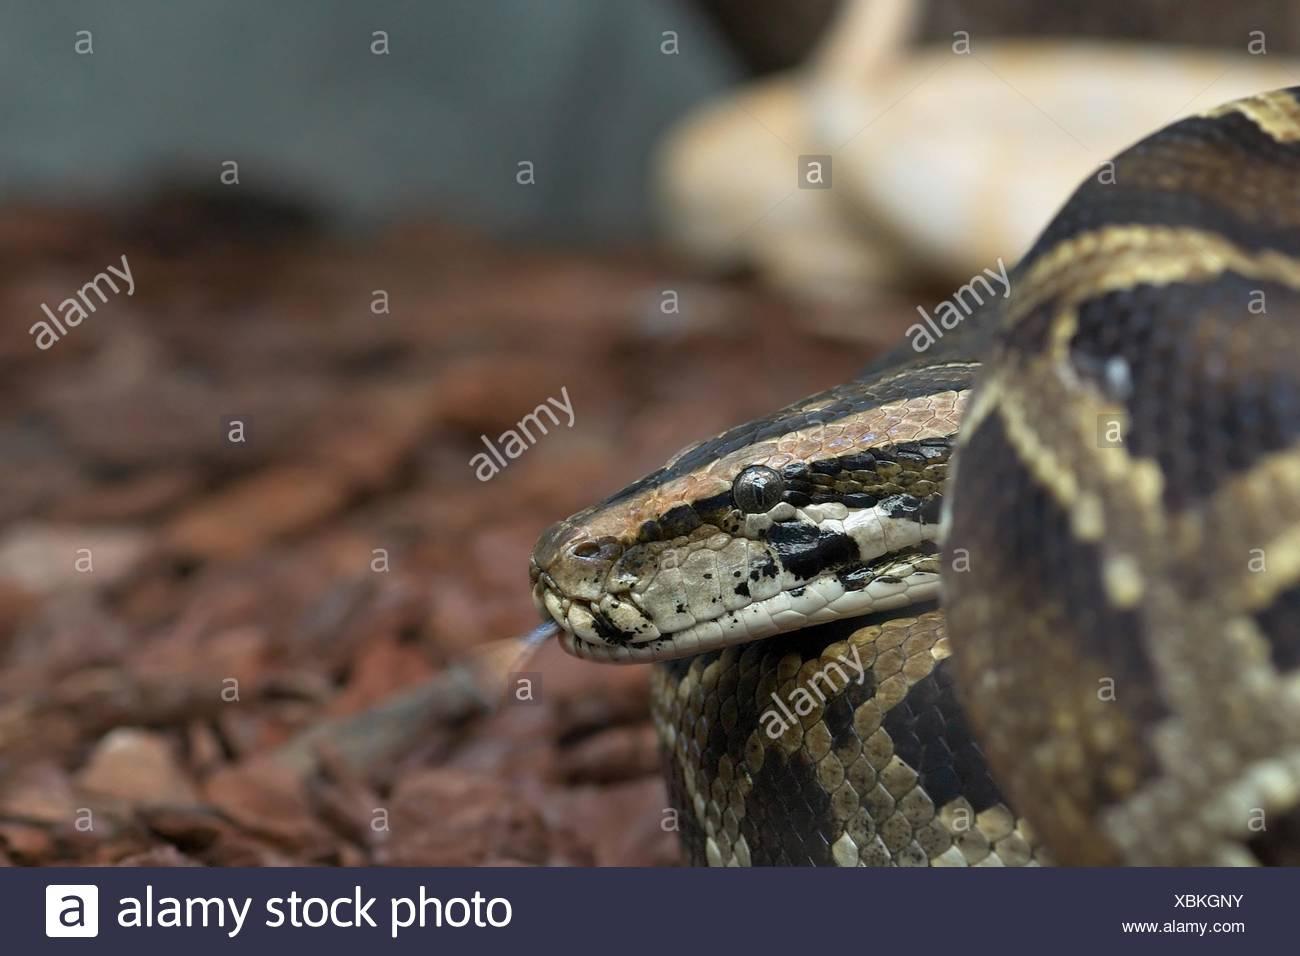 Danger Reptile Brown Brownish Brunette Tongue Fear Terrarium Snake